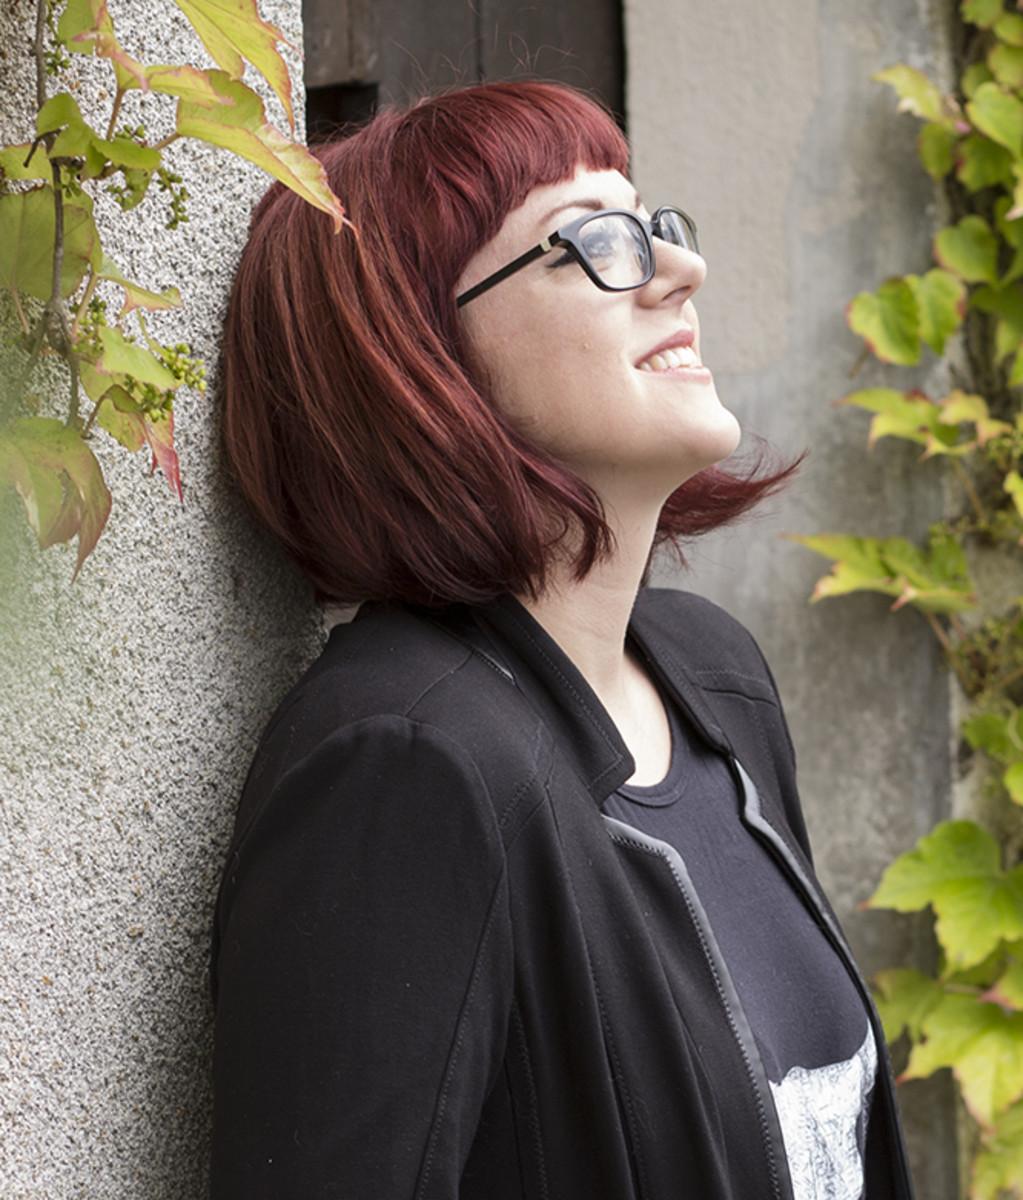 Victoria Schwab, the book's author